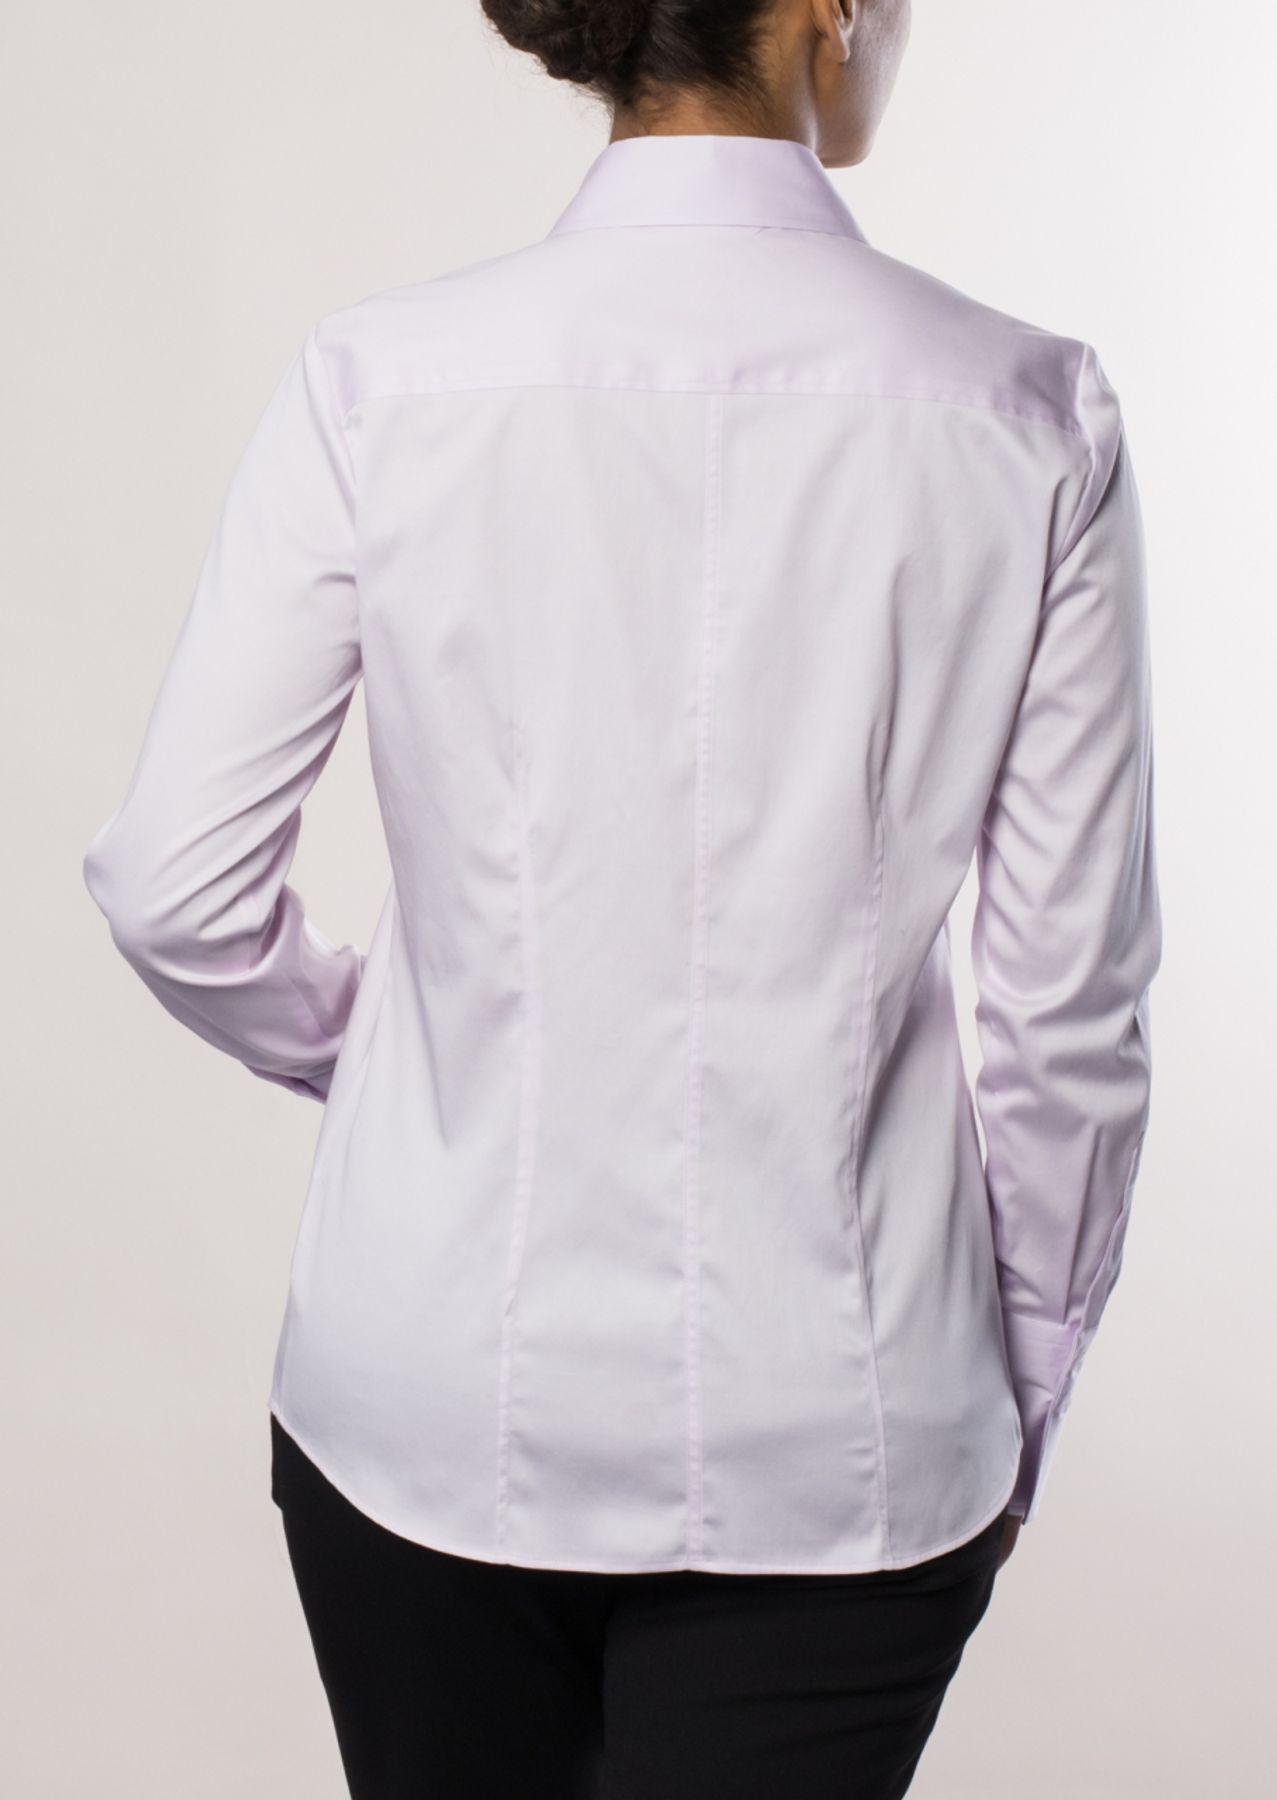 Eterna - Comfort Fit - Damen Langarm Bluse in Rosa (5352 D624) – Bild 2